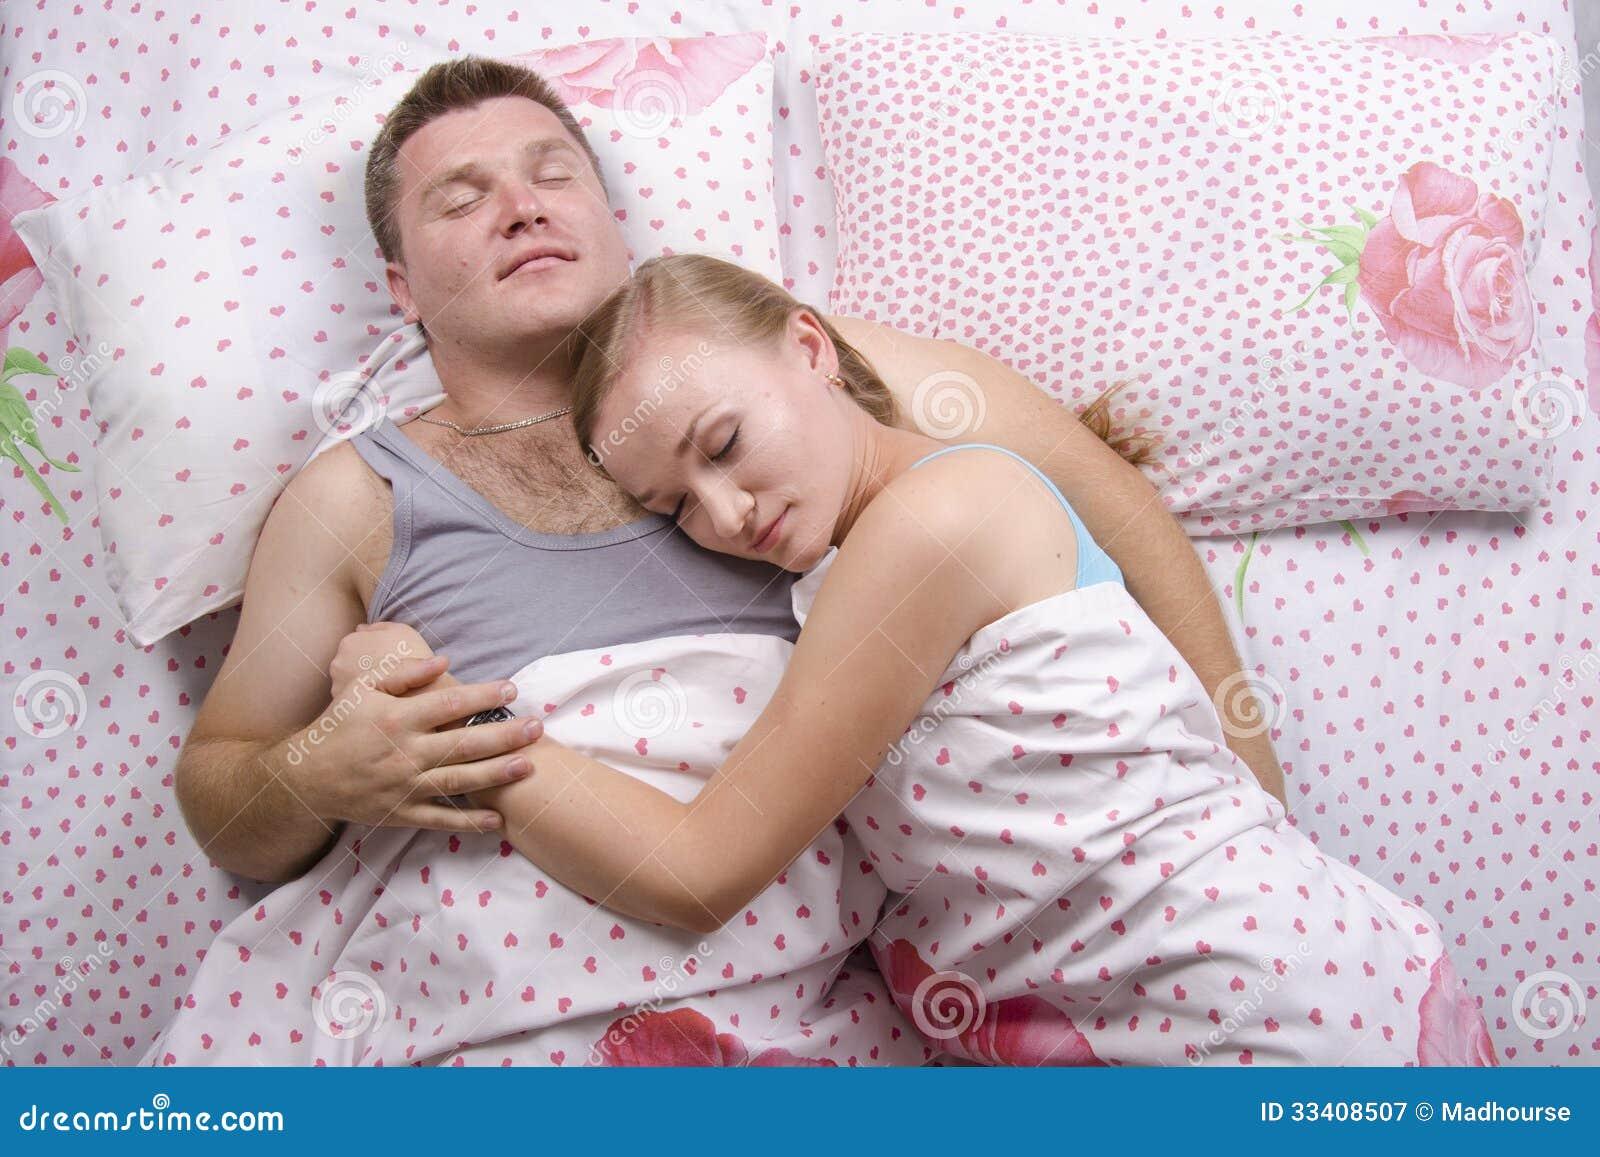 seks-russkiy-intsest-brat-s-sestroy